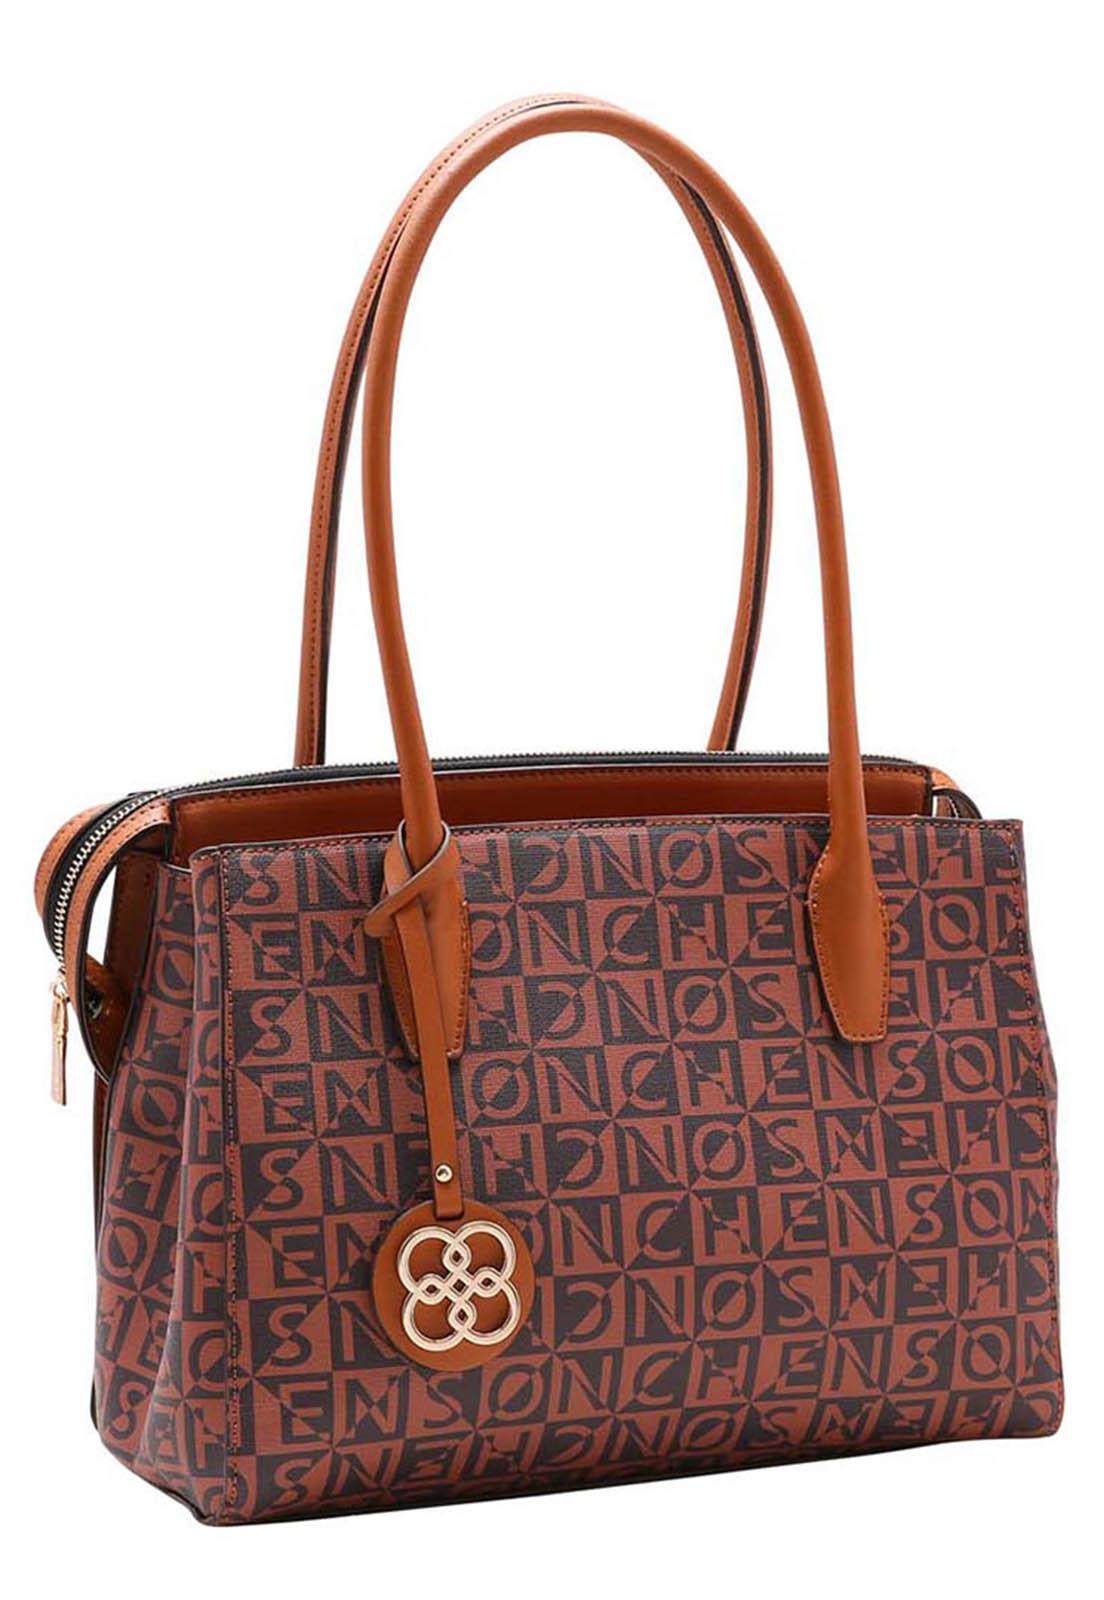 Bolsa Feminina Chenson Monograma Tridimensional Mão 3483439